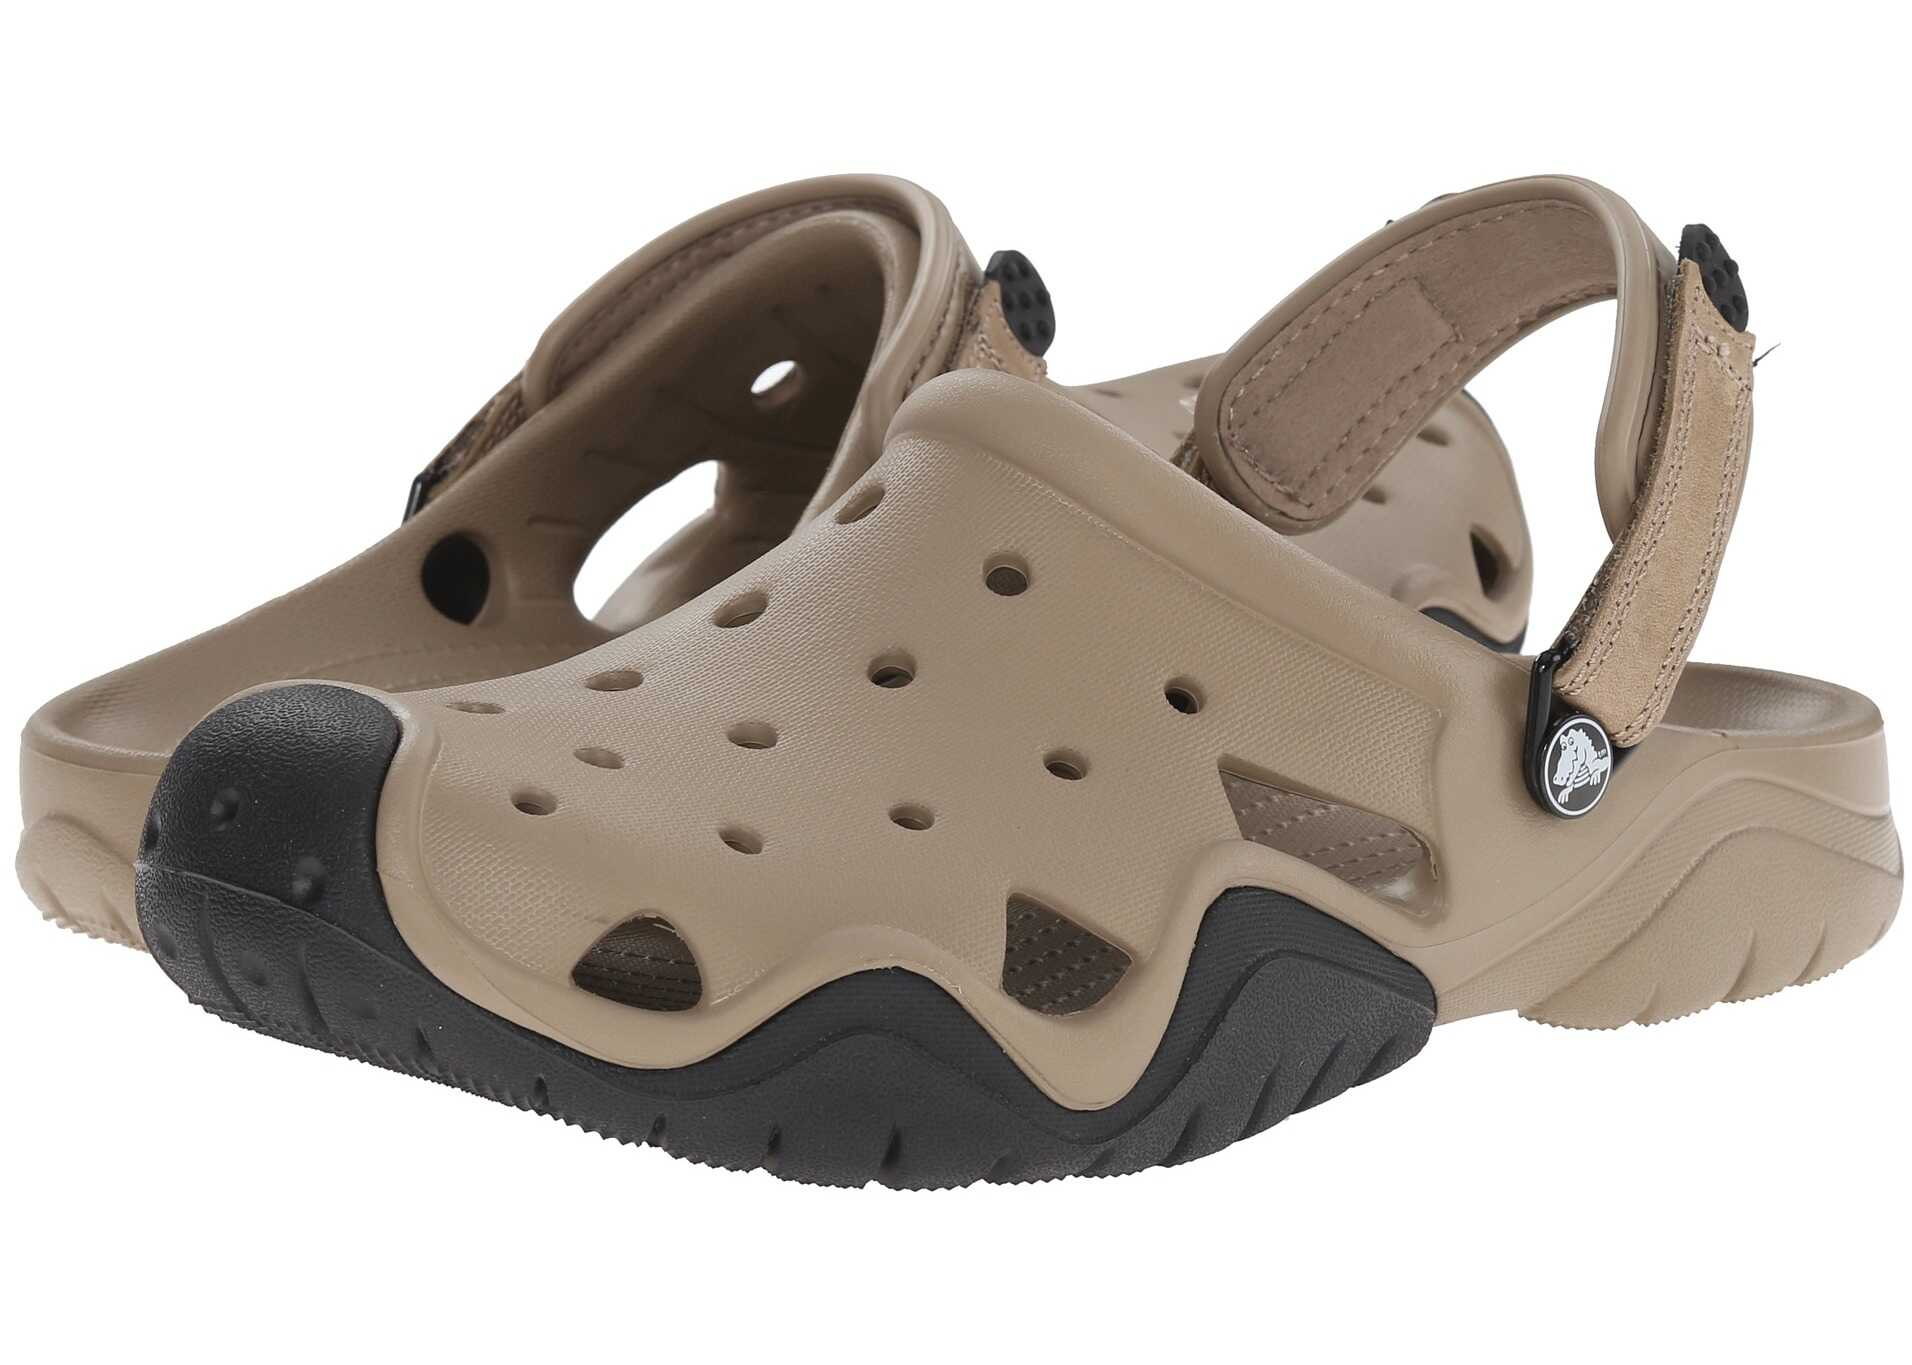 Crocs Swiftwater Clog Khaki/Black